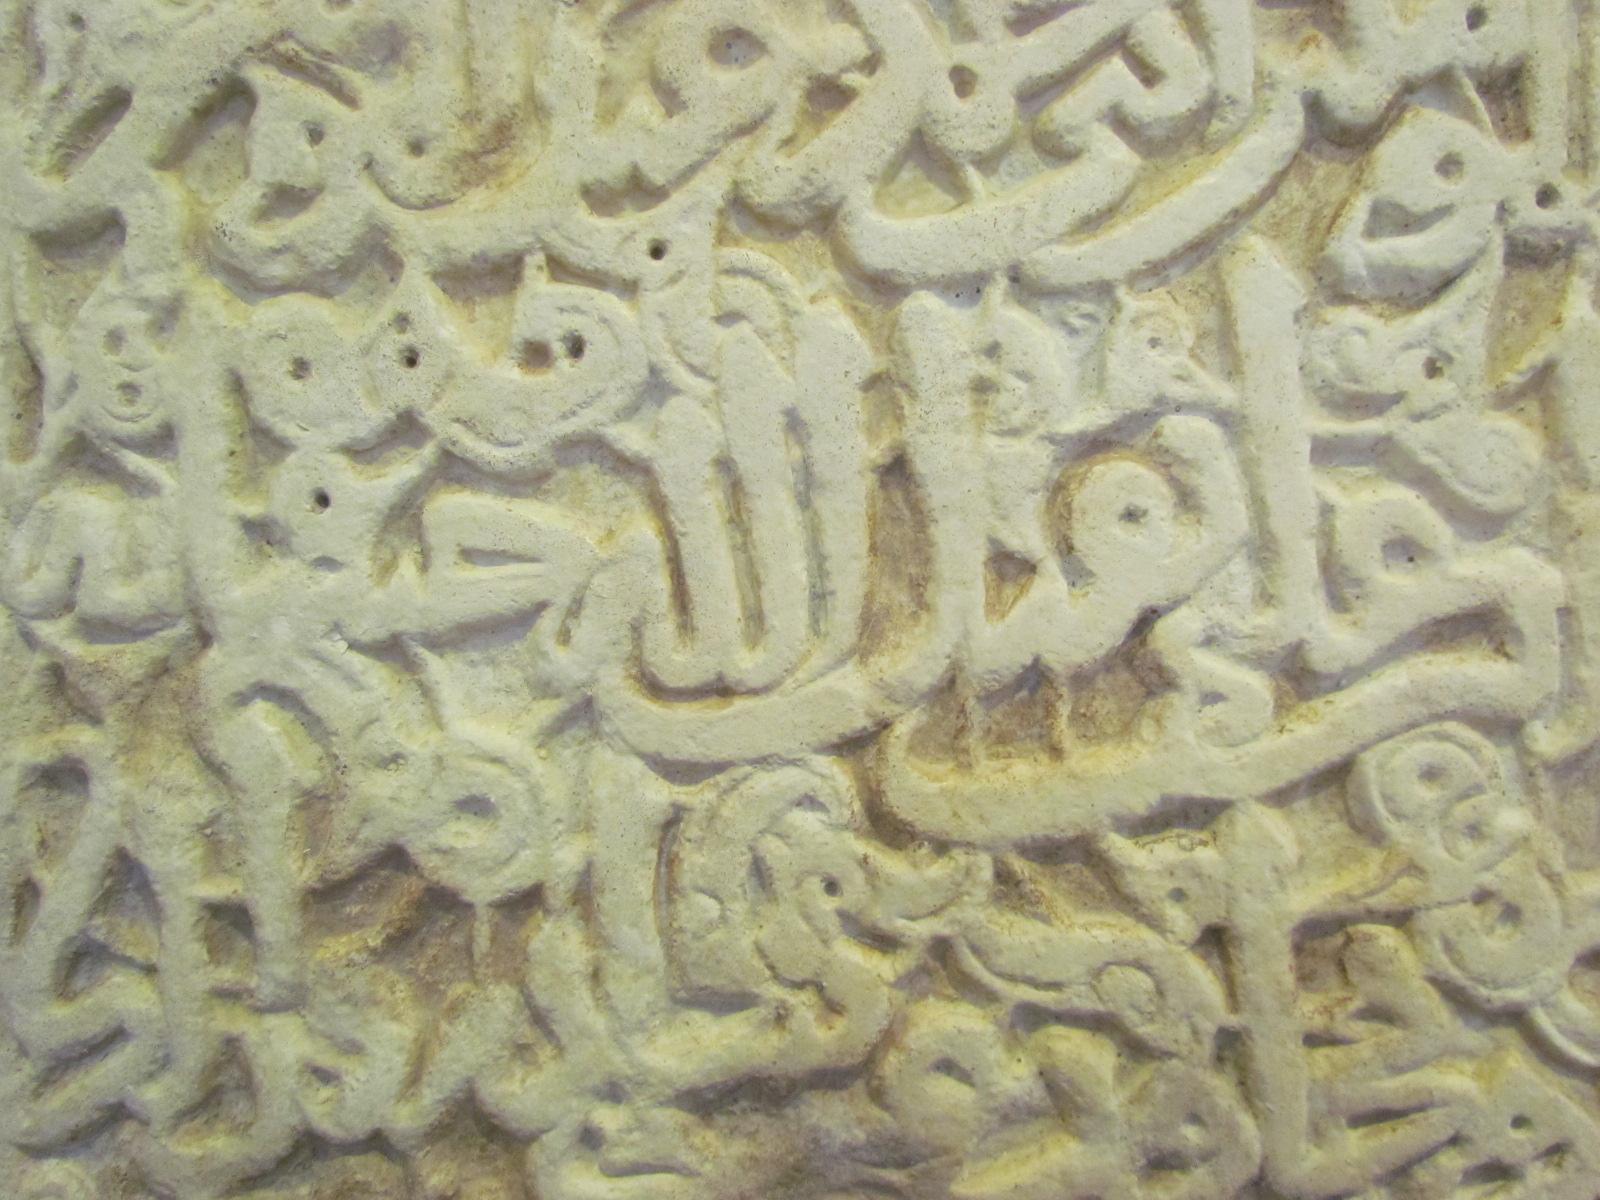 Arabic symbols